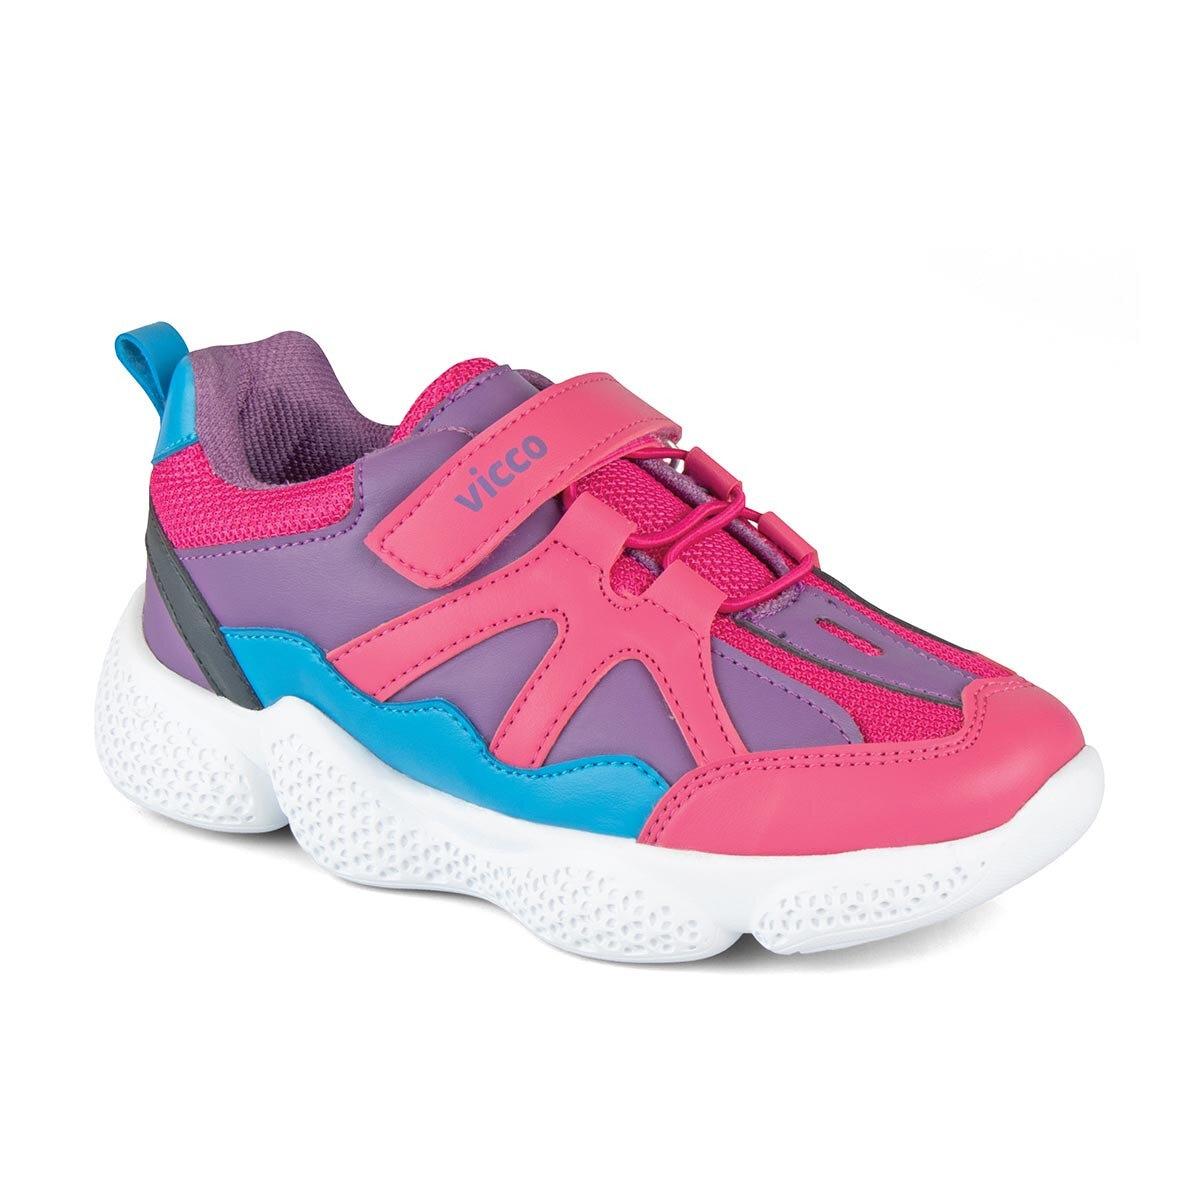 FLO 346. P19K. 133 BOOTIES PHYLON Fuchsia Female Child Sneaker Shoes VICCO